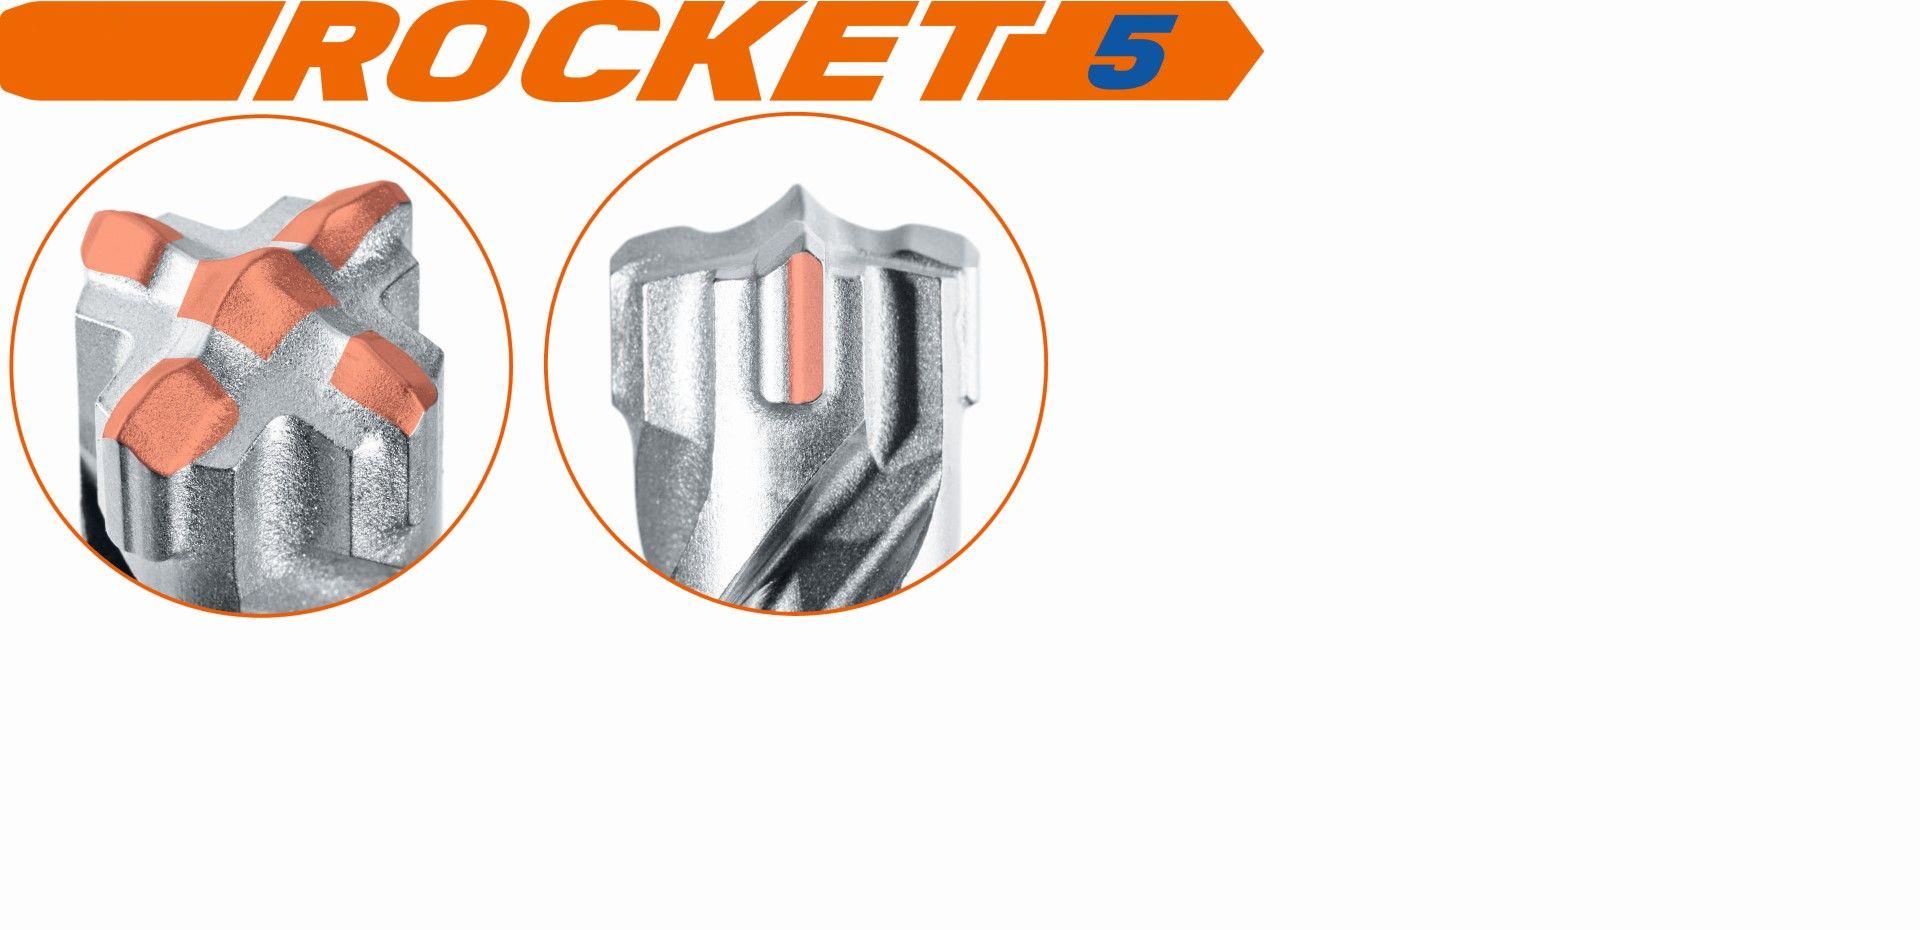 Slika BORER Rocket 5 SDS-plus 12x160mm 4-kraka